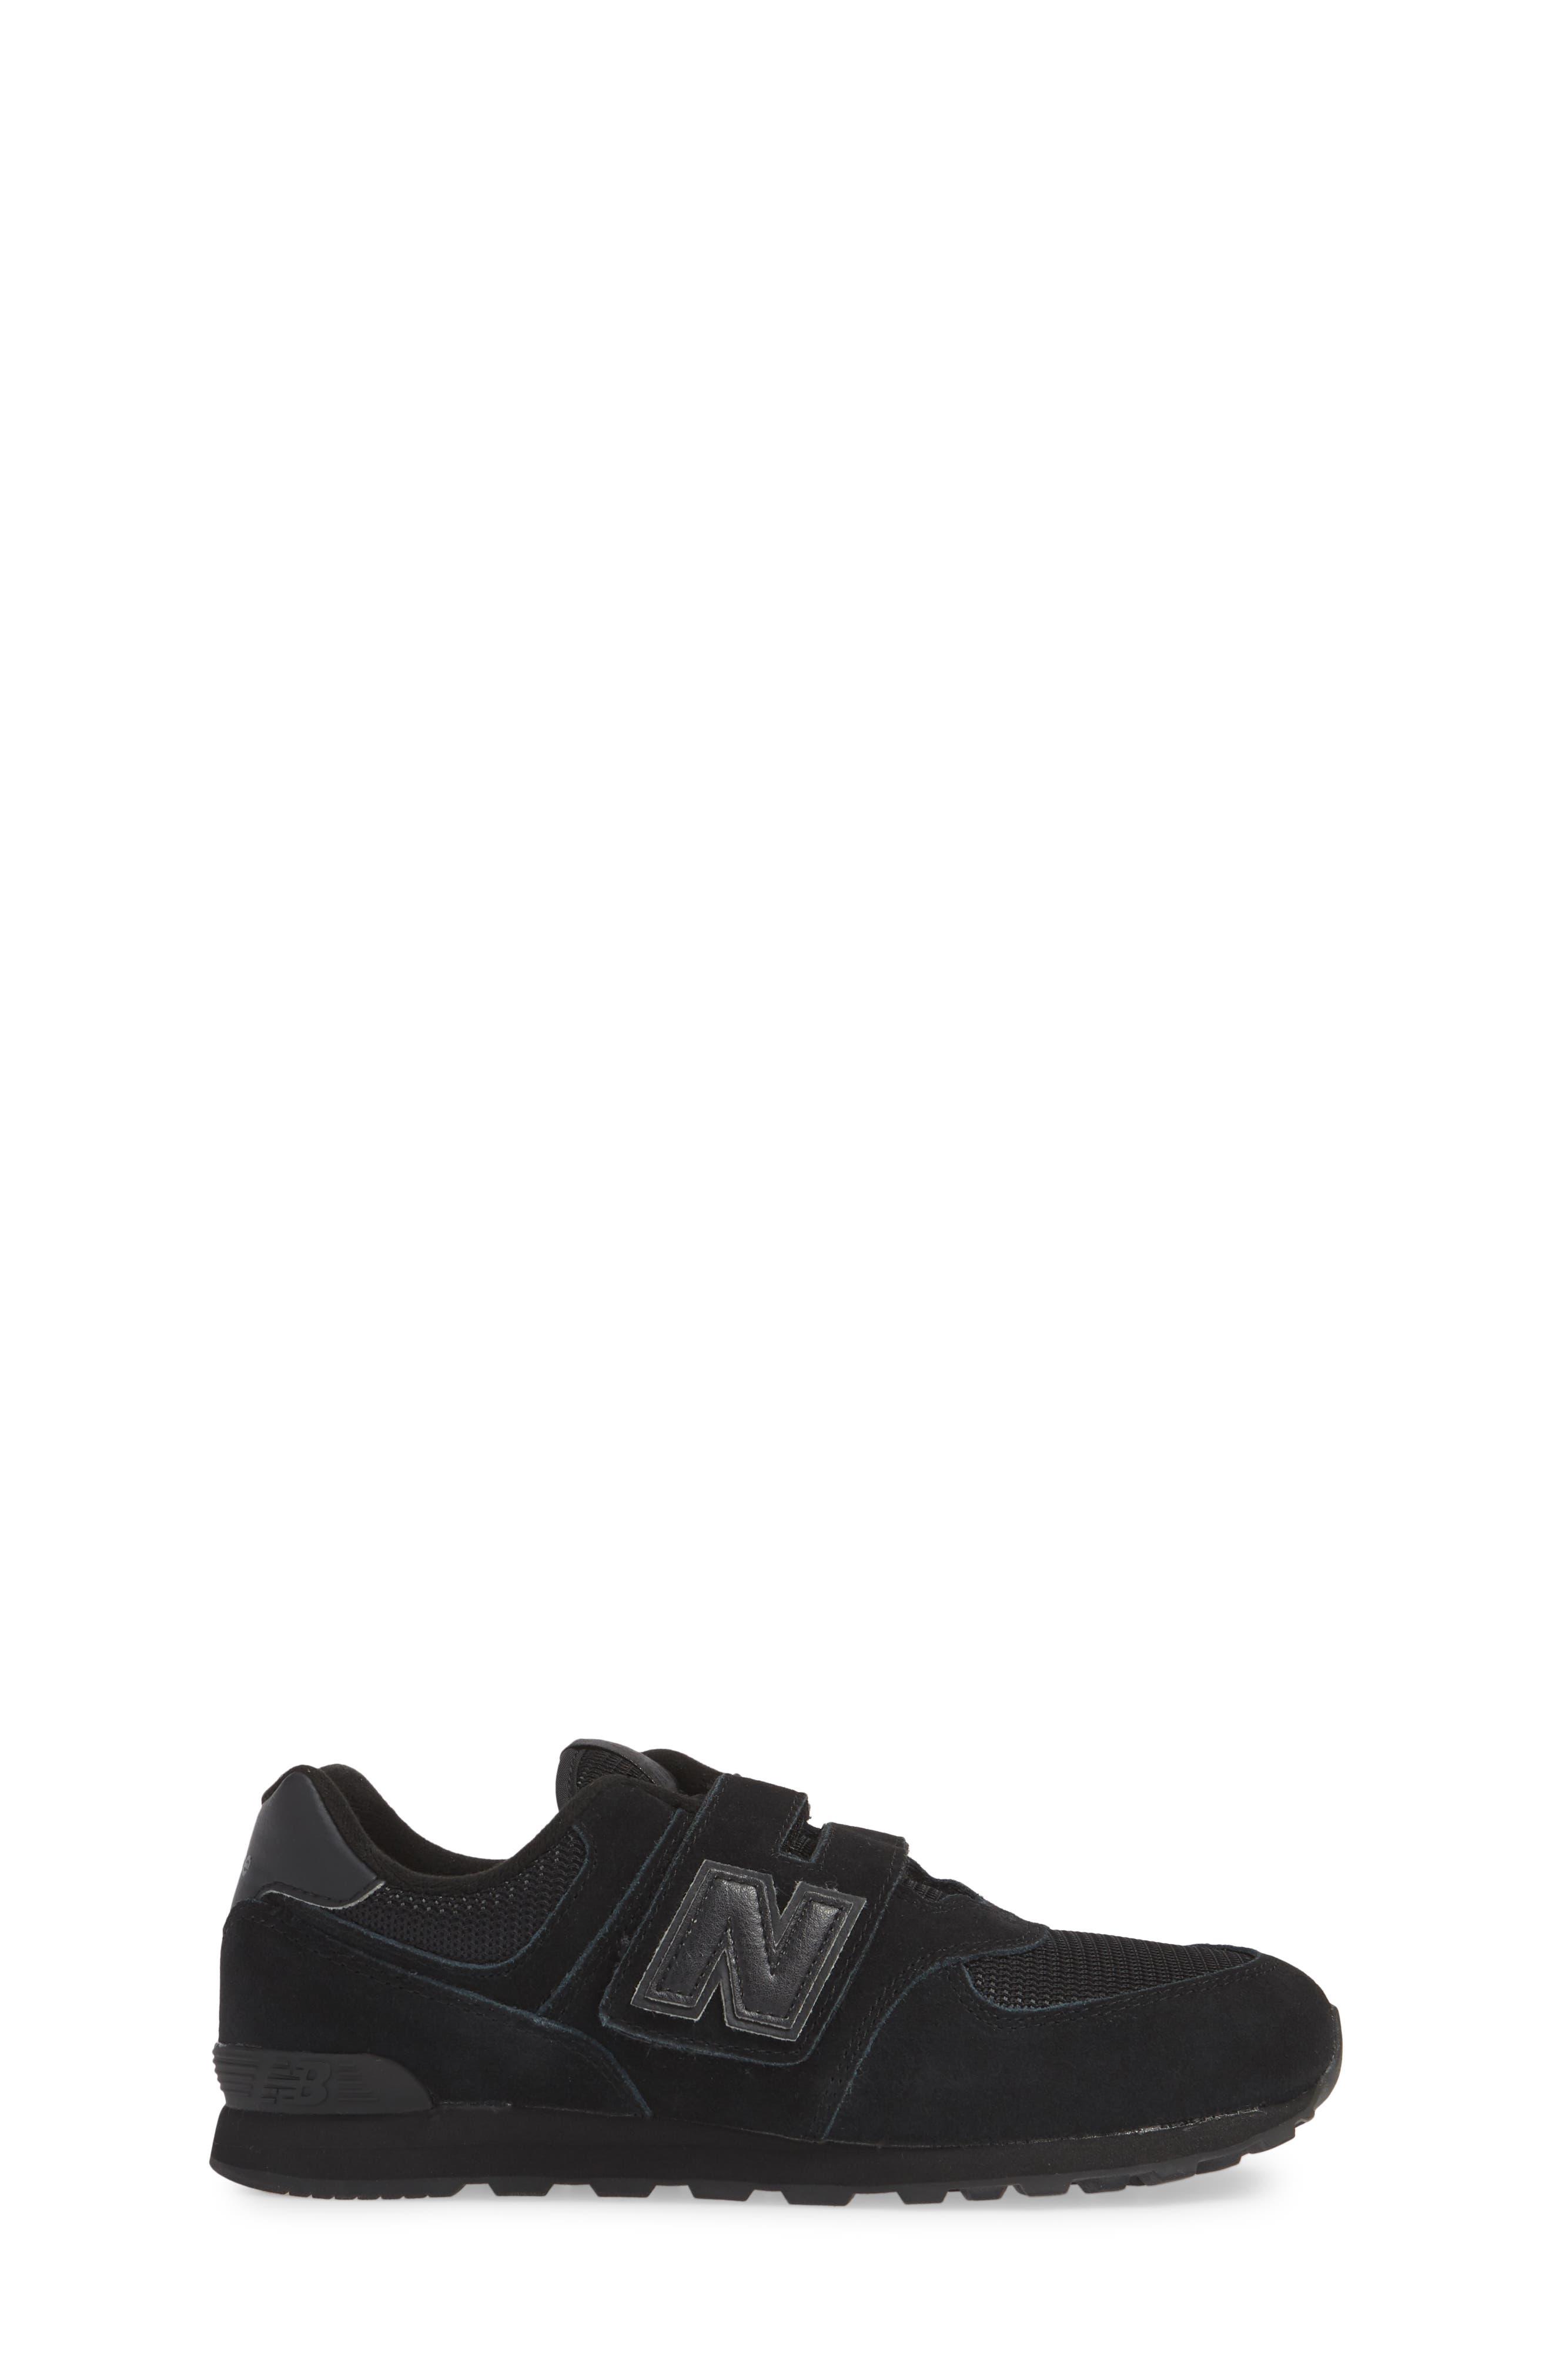 NEW BALANCE,                             574 Retro Surf Sneaker,                             Alternate thumbnail 3, color,                             BLACK/ BLACK